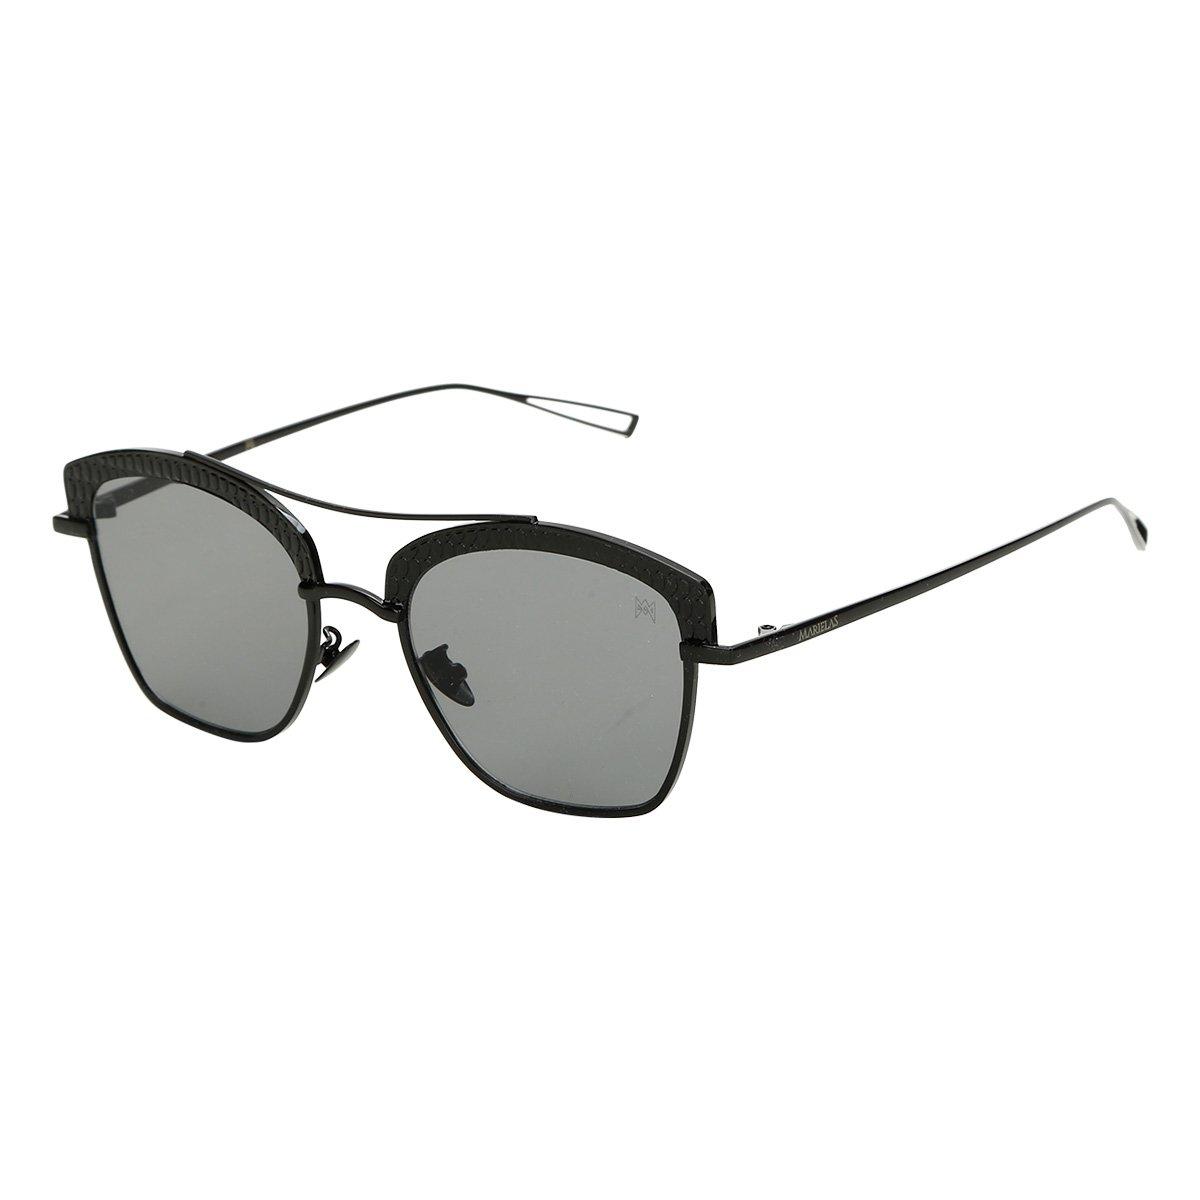 e84674931 Óculos de Sol Marielas Aurora B5277 Feminino